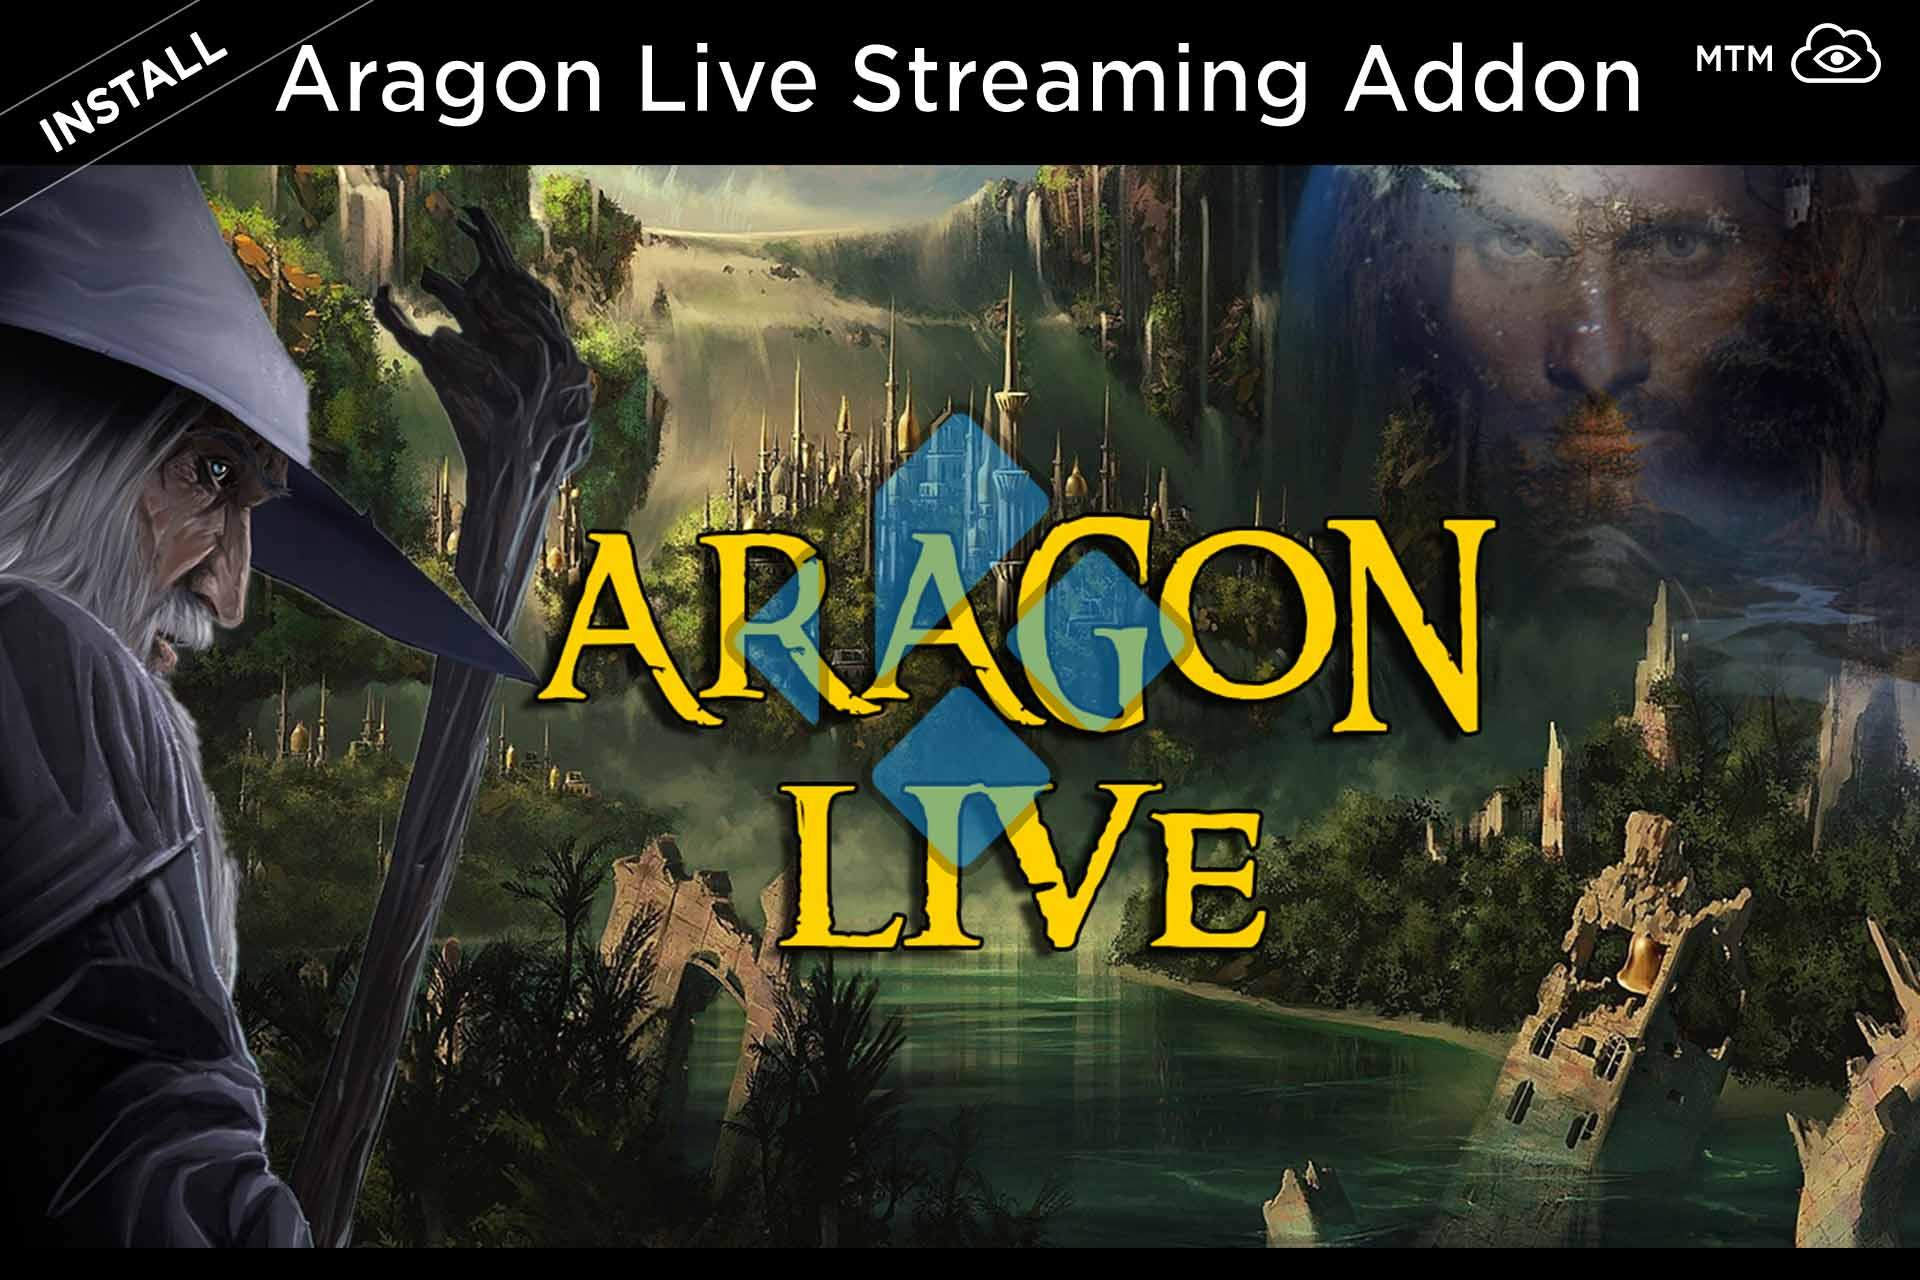 Nola instalatu Aragon Live IPTV Kodi TV Addon Blamo Repo-tik